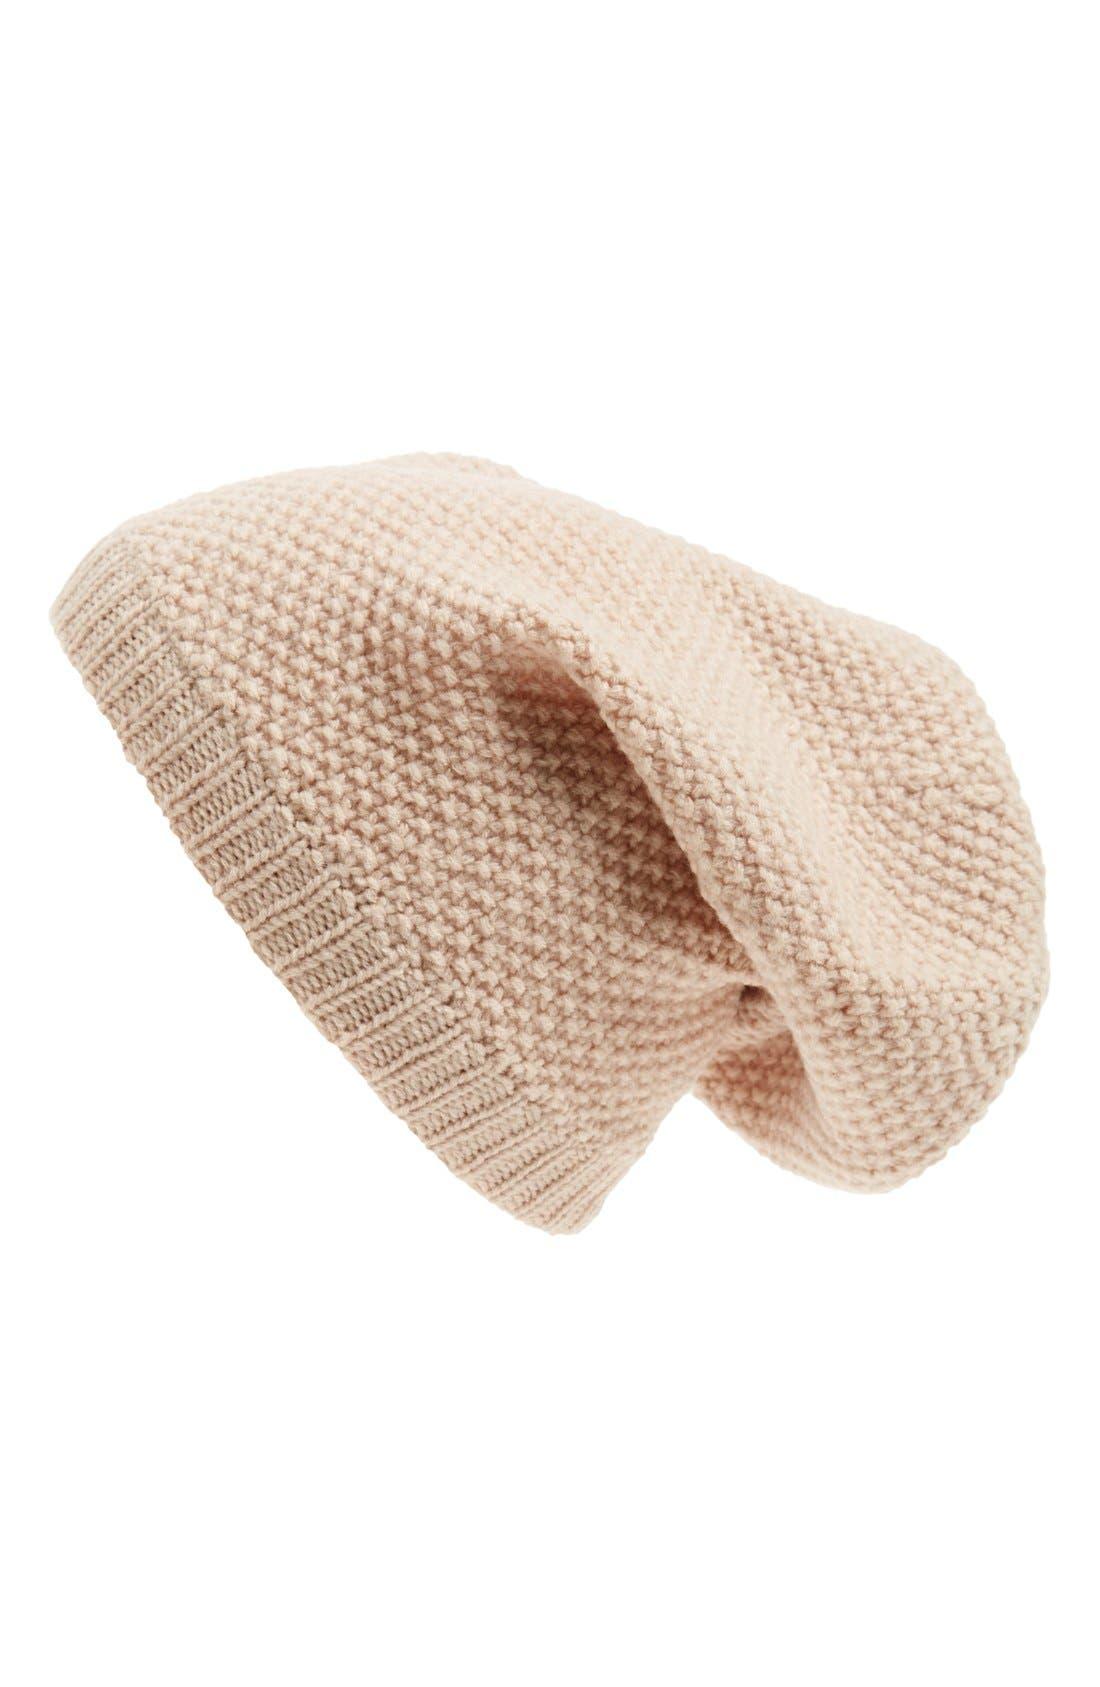 Main Image - Sole Society Wool Knit Beanie